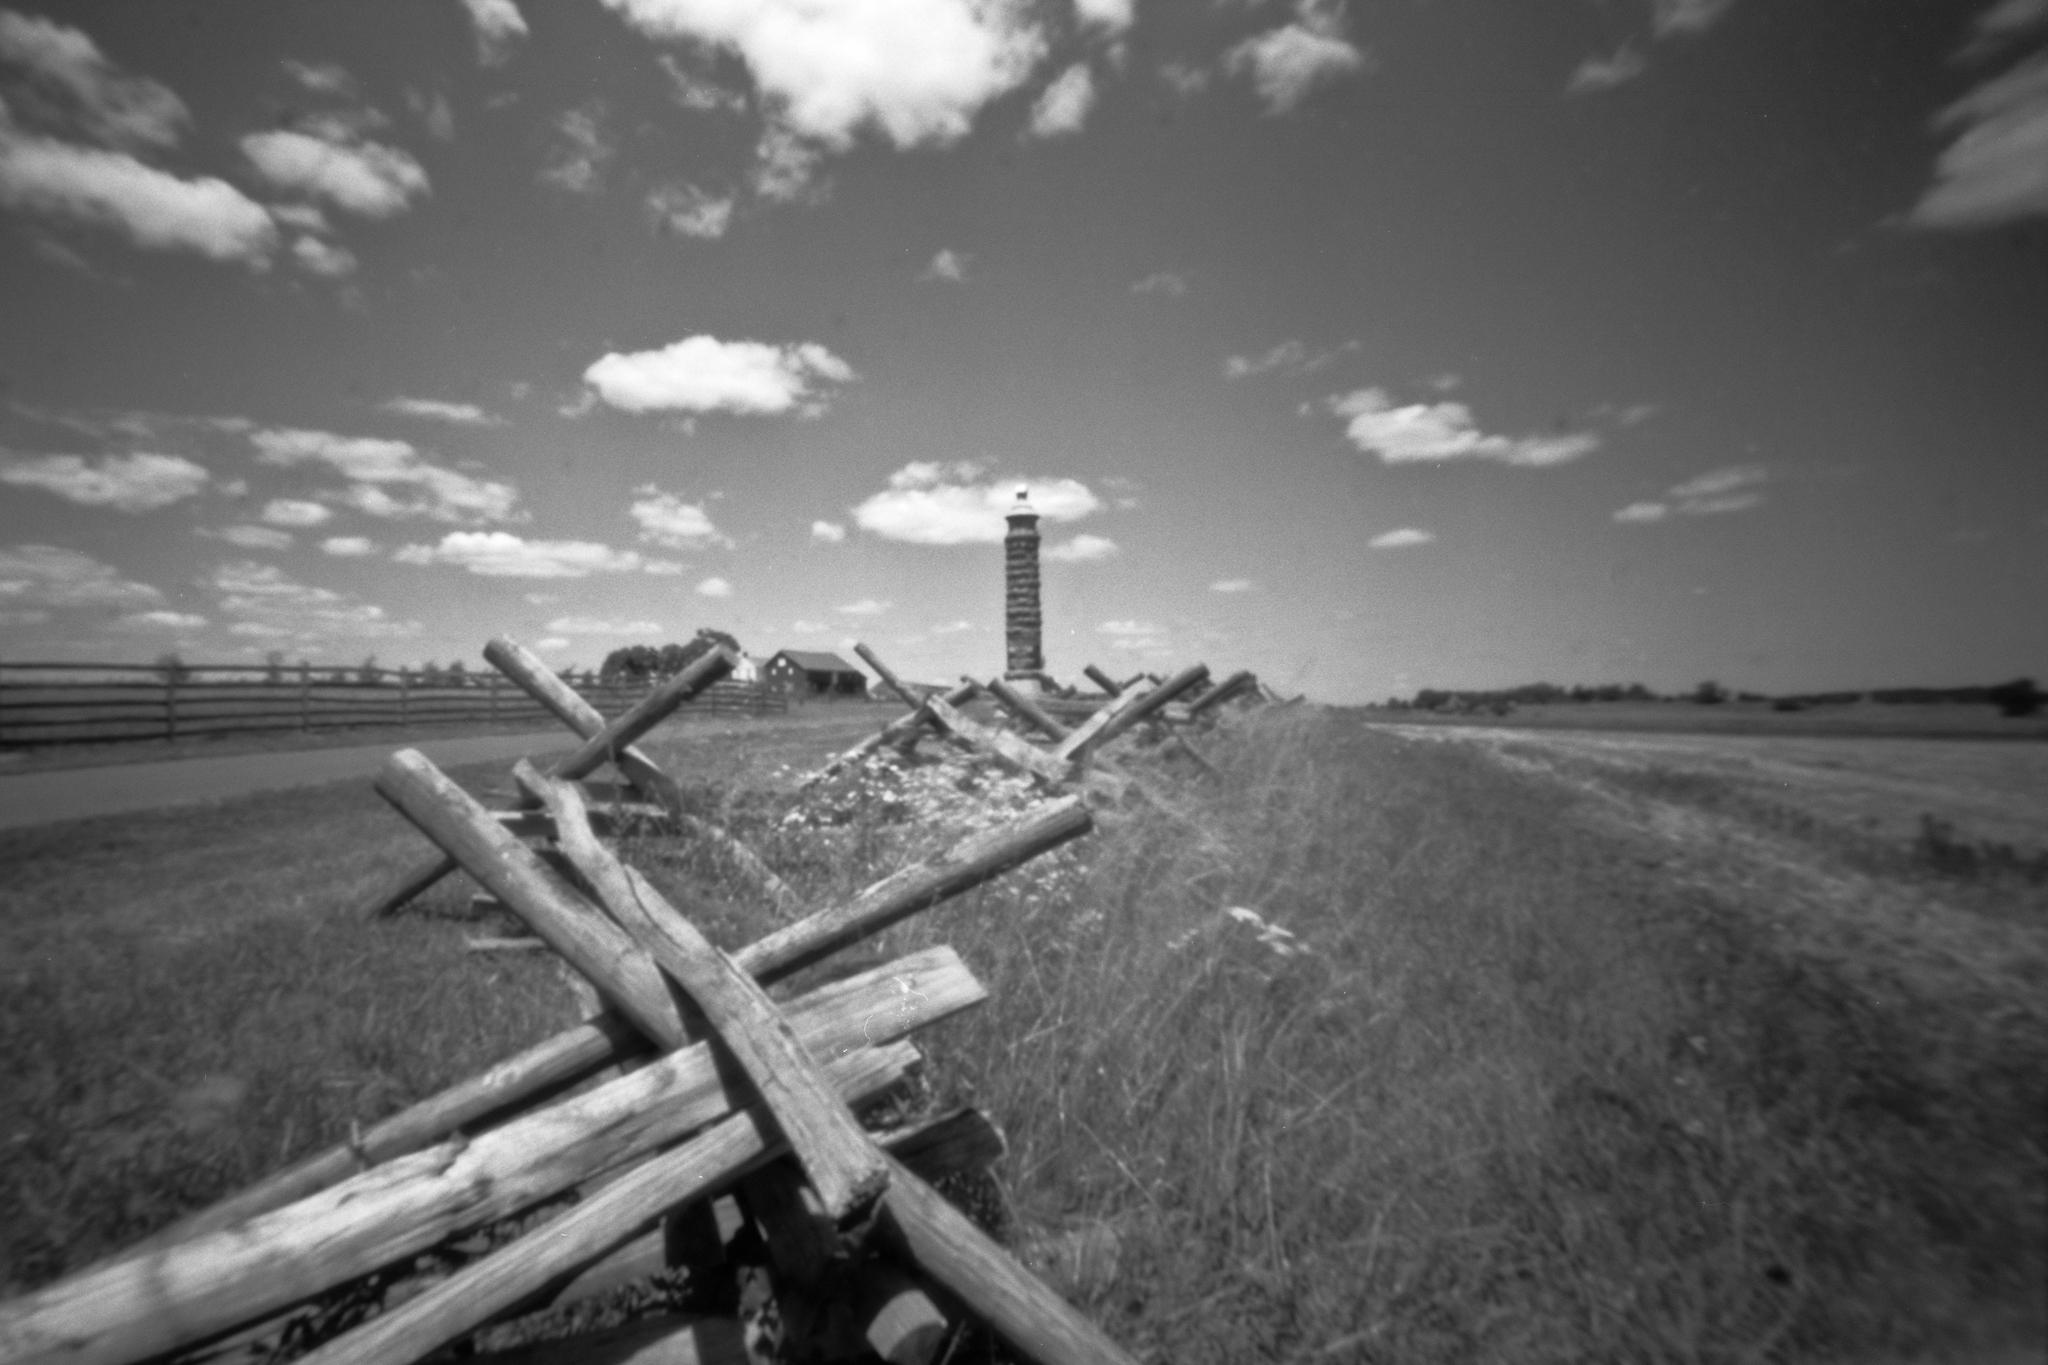 Gettysburg National Military park. Gettysburg, Pennsylvania. Zero Image 6x9.